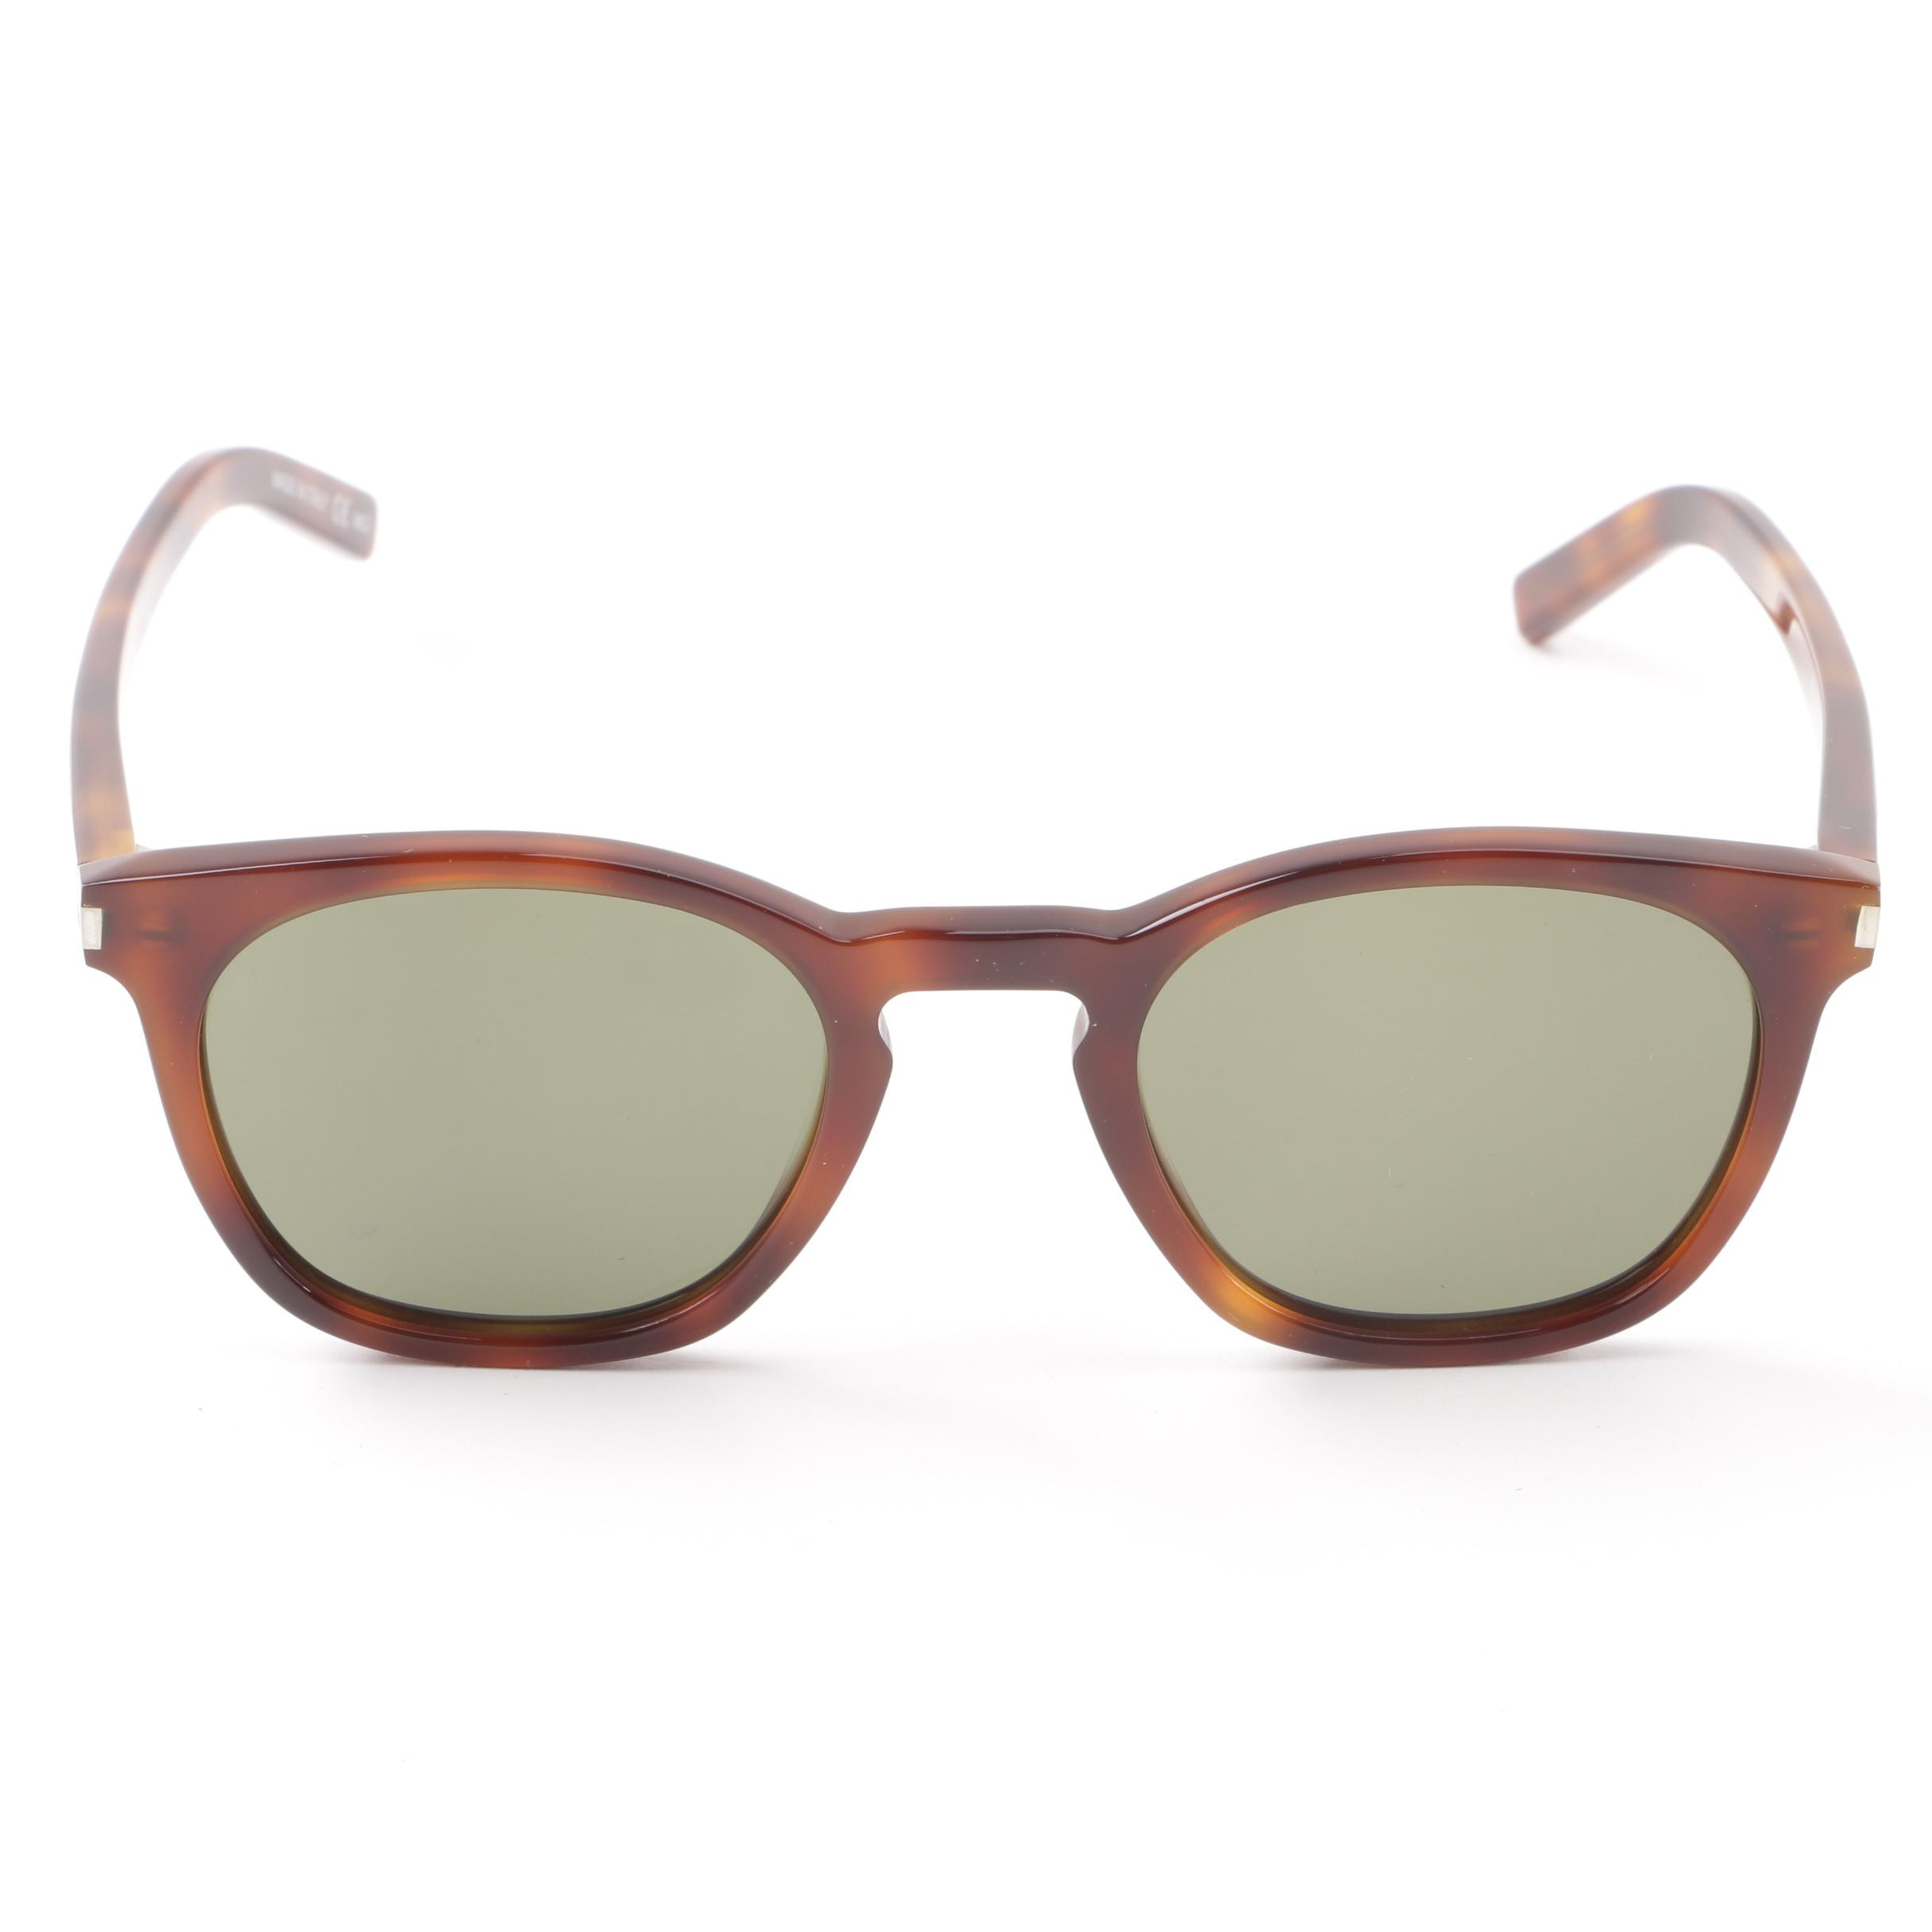 Saint Laurent Paris SL28 003 Tortoiseshell Style Sunglasses with Case